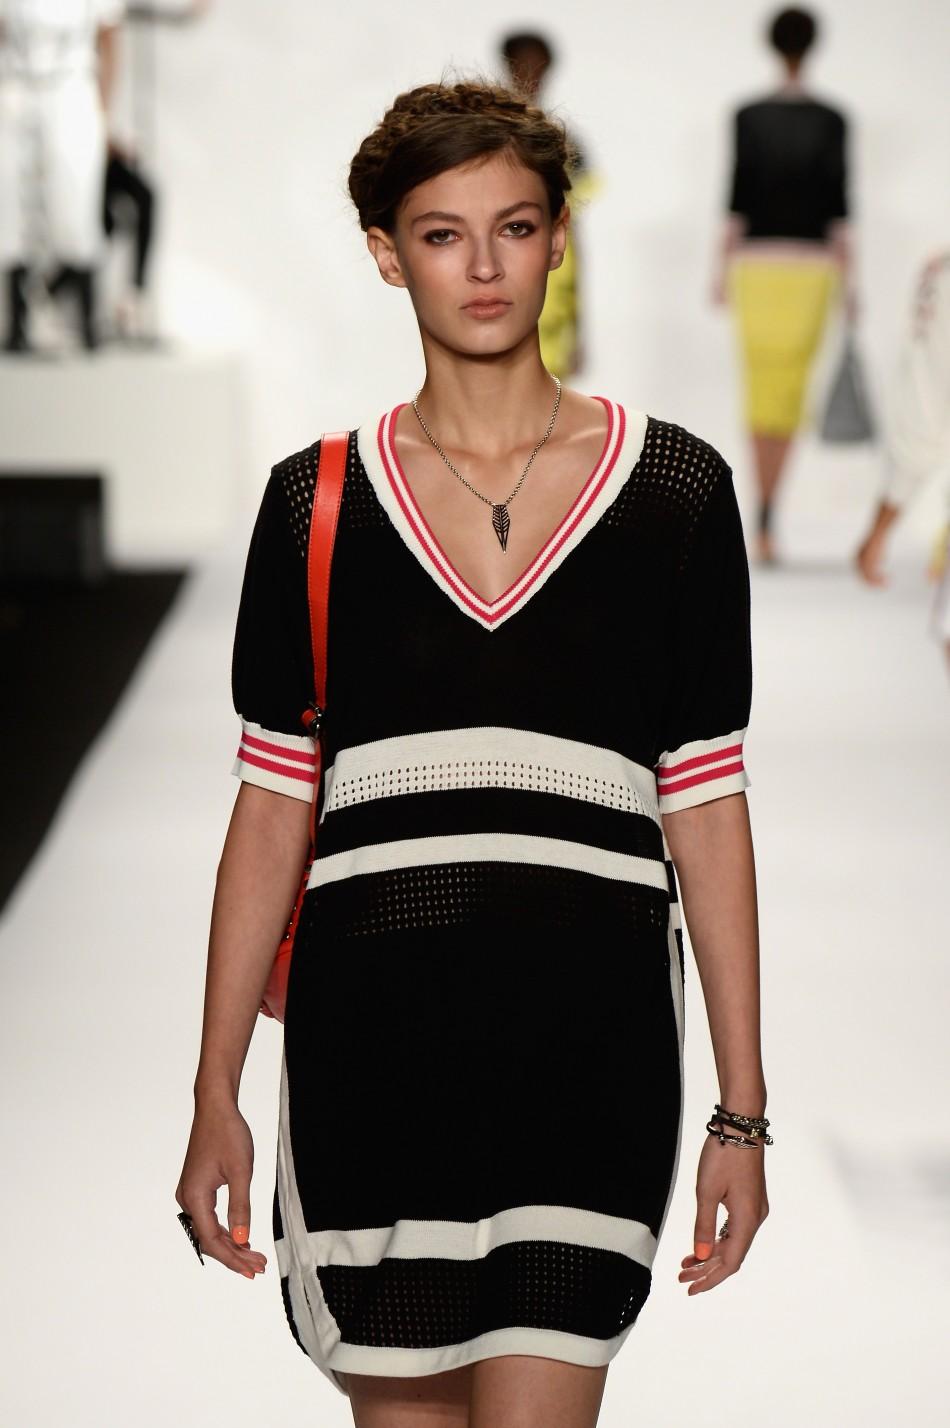 20580-rebecca-minkoff-spring-2014-new-york-fashion-week.jpg